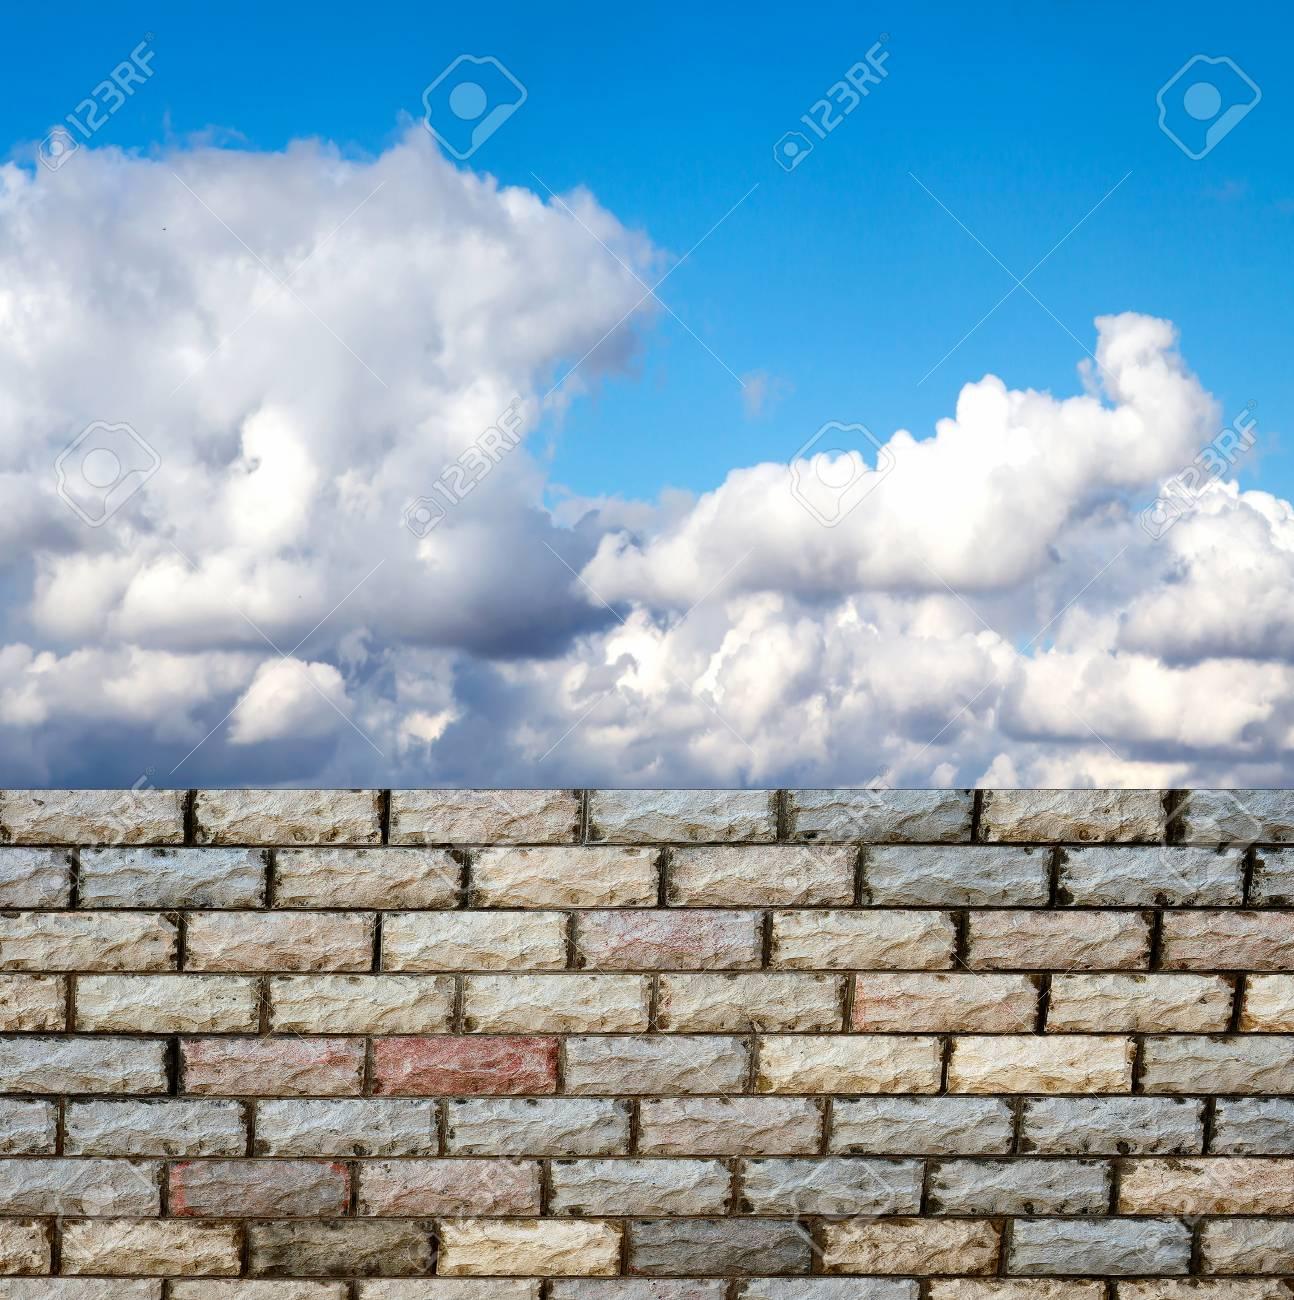 Dekorative Ziegelmauer Wand Gegen Blauen Himmel Standard Bild 27098404